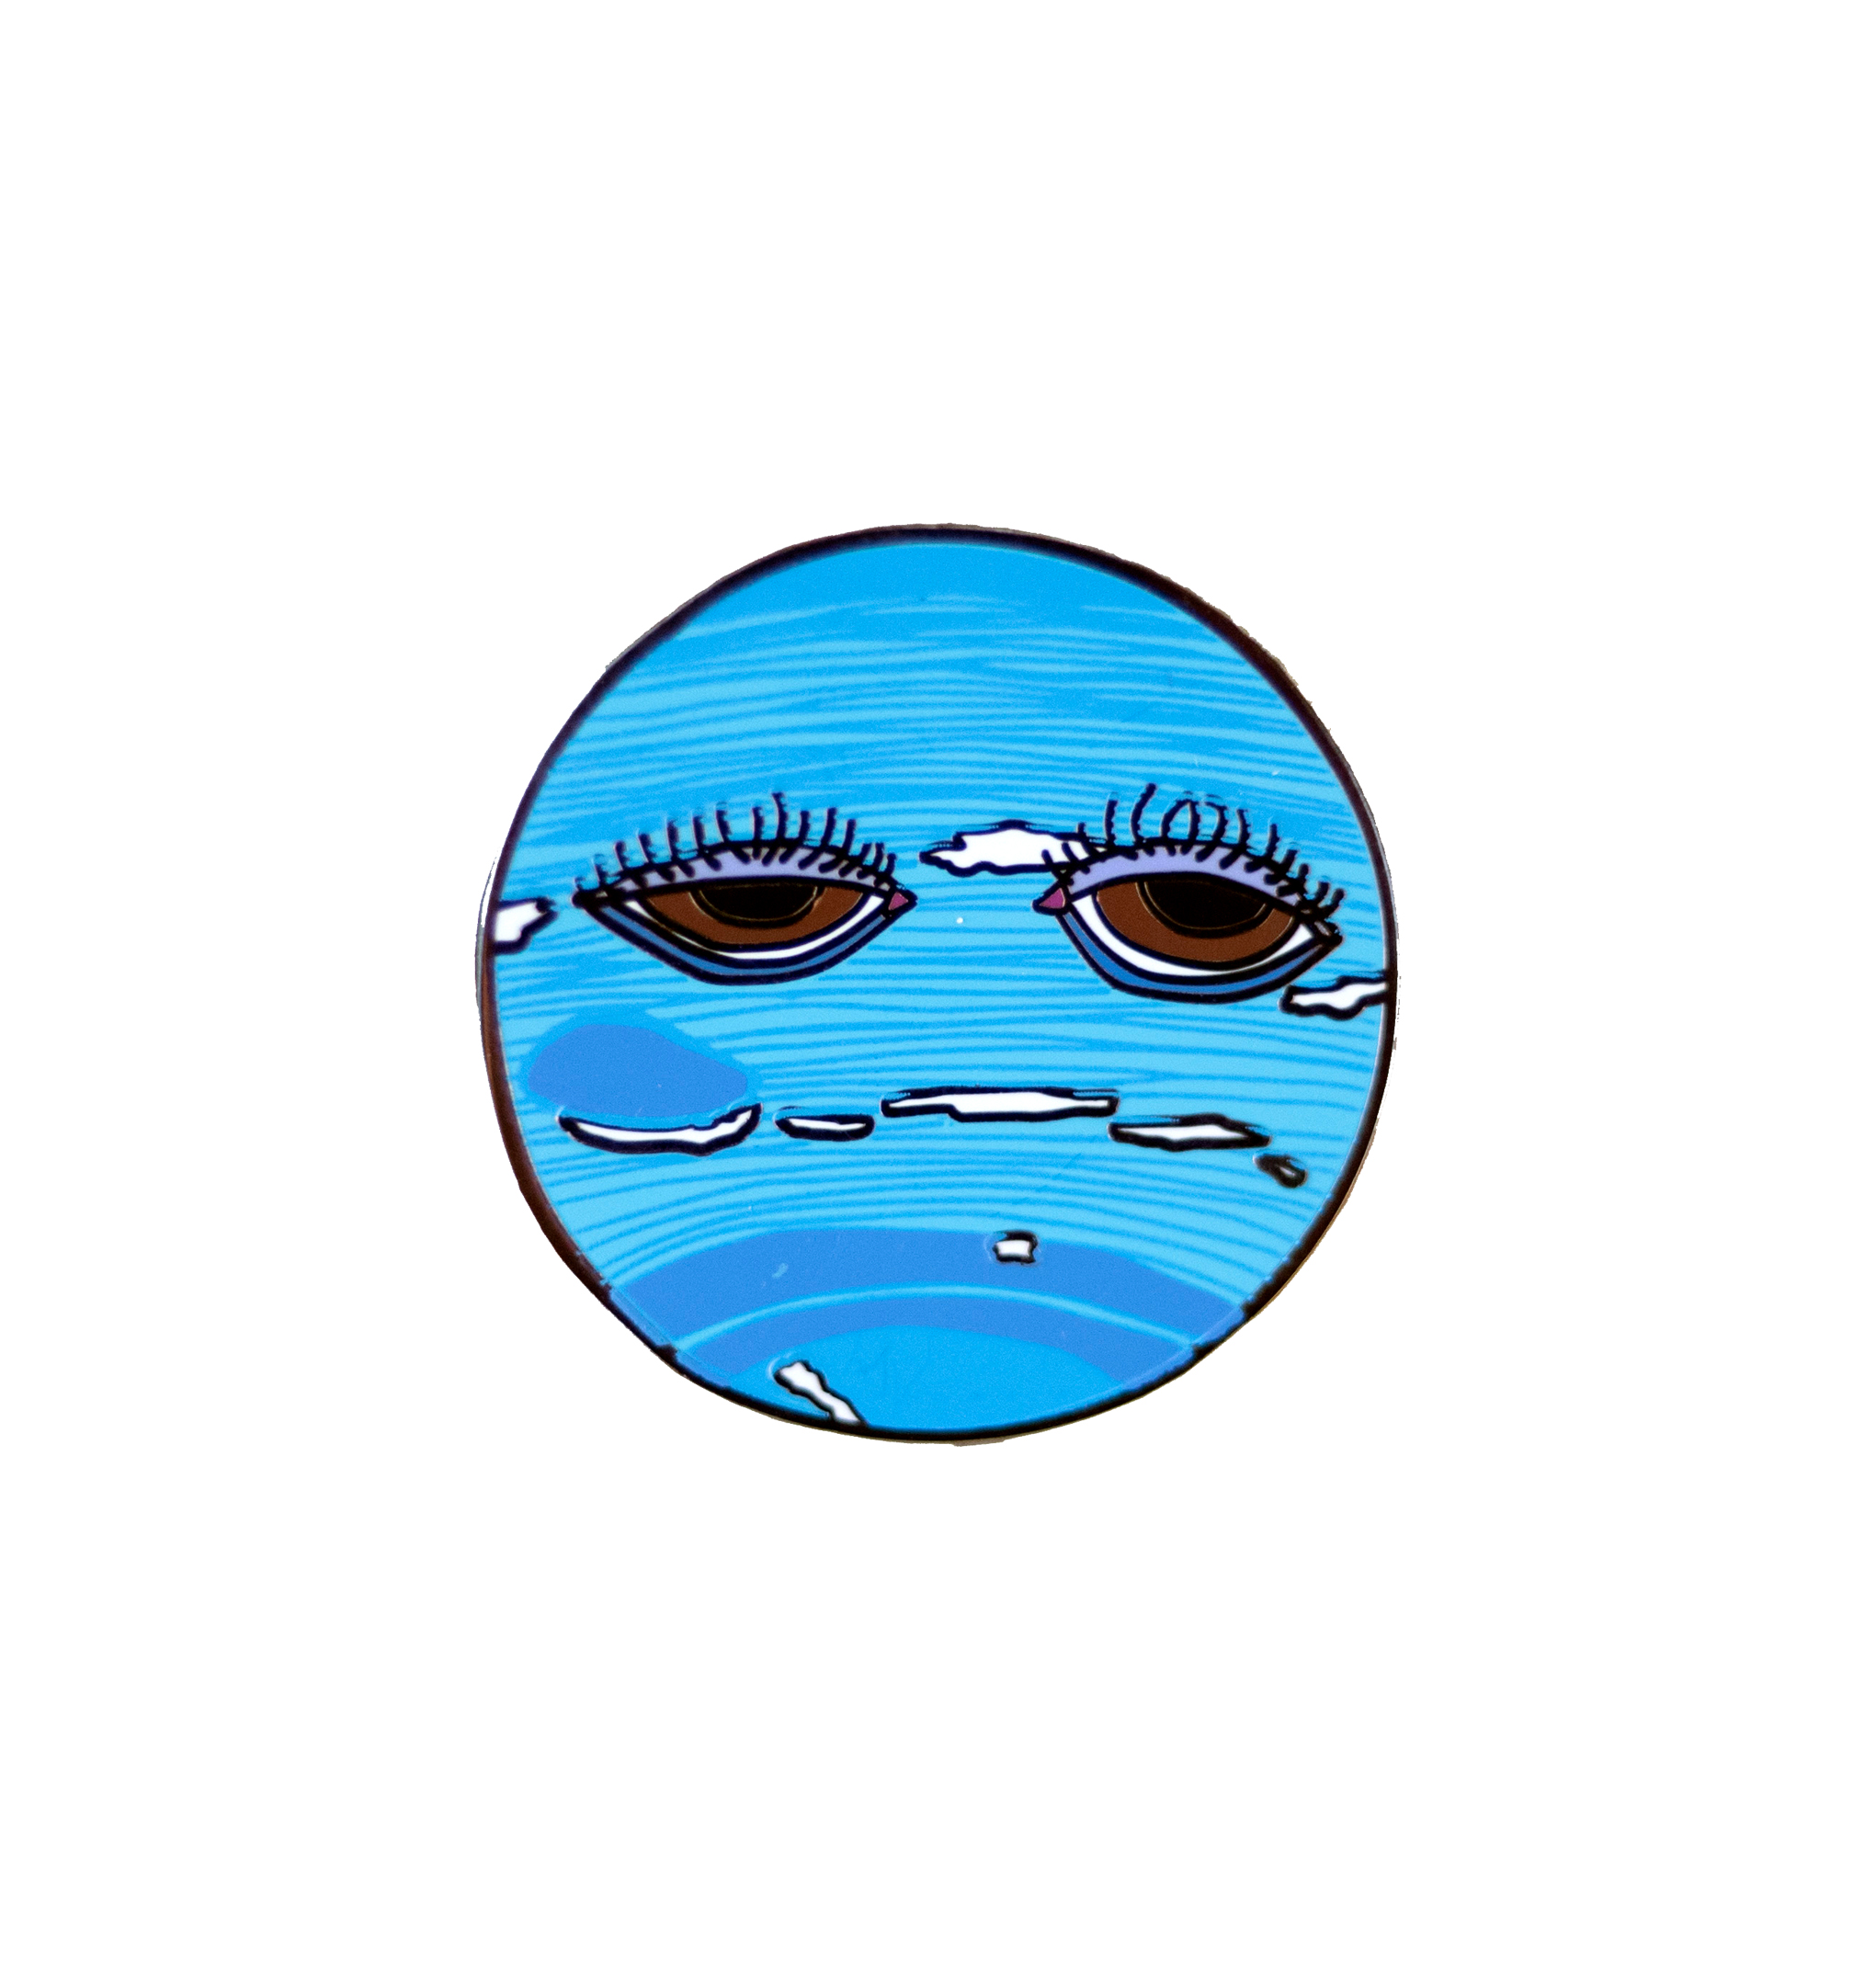 Sad Neptune Enamel Pin  $10 (U.S. shipping included)